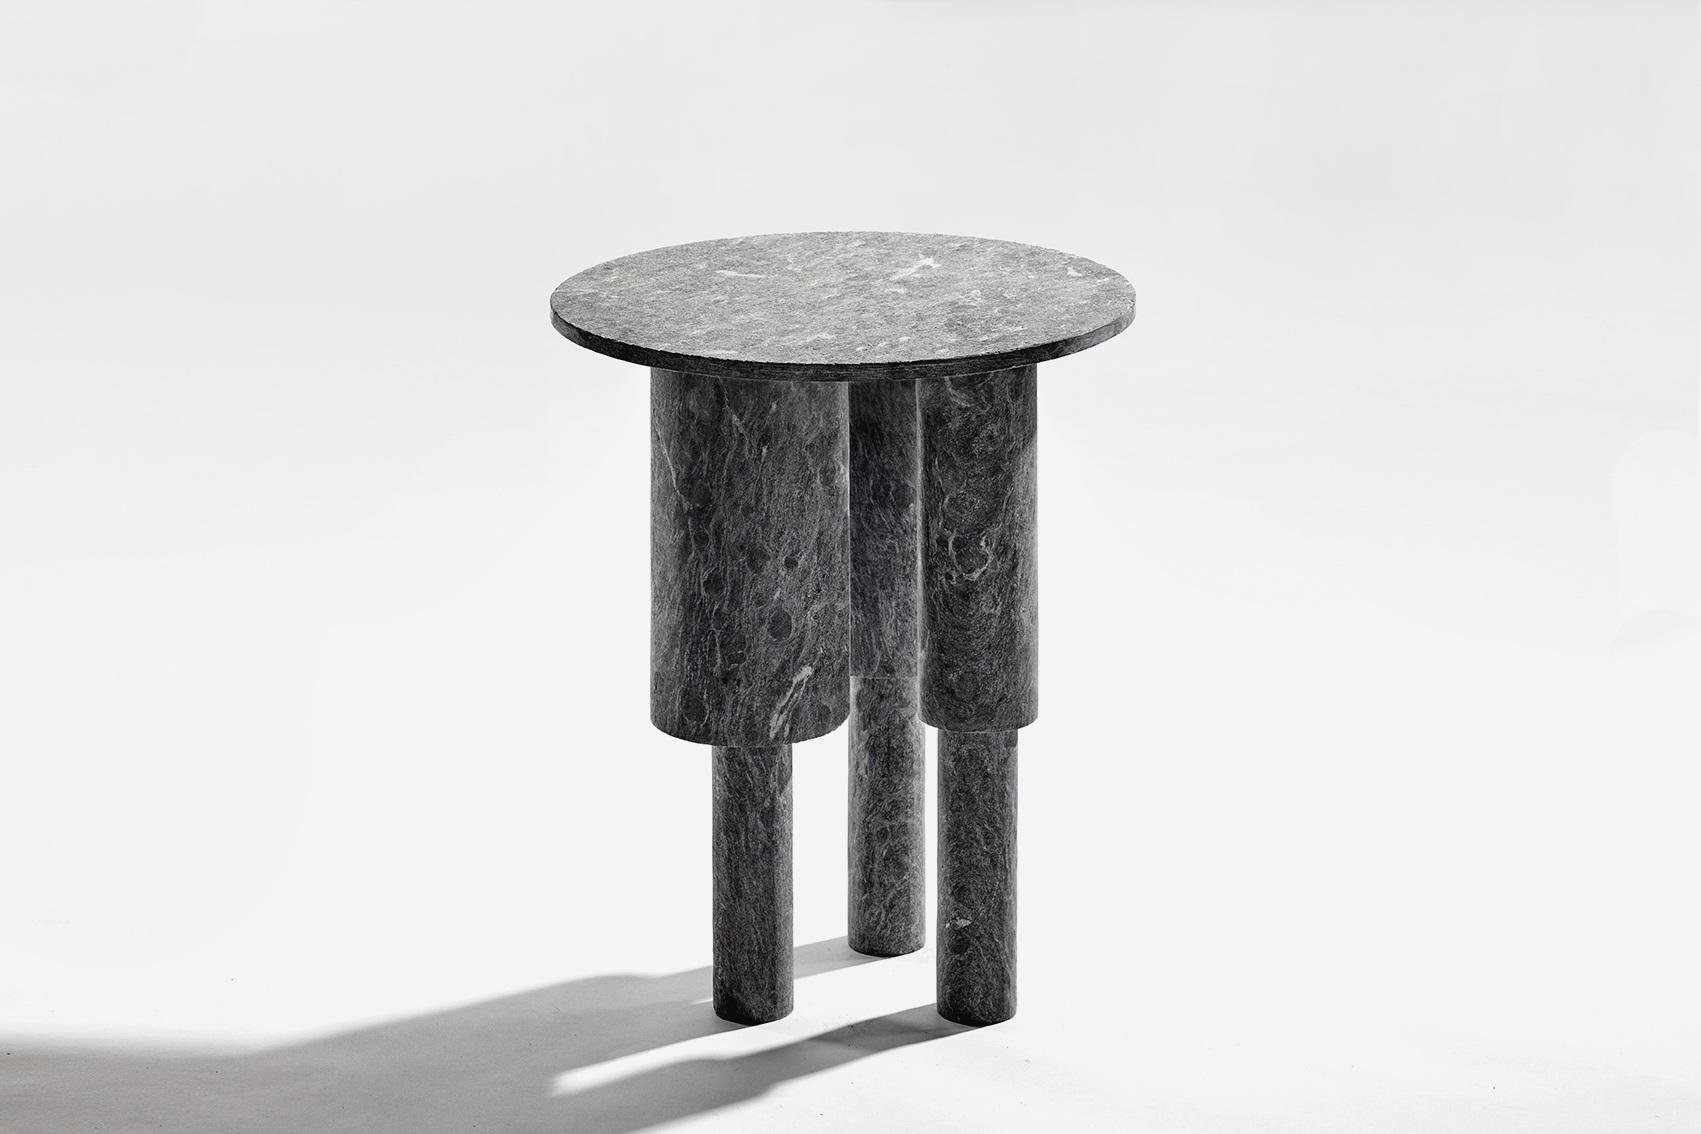 munoz-josefina-design-marble-black_tables-4.jpg